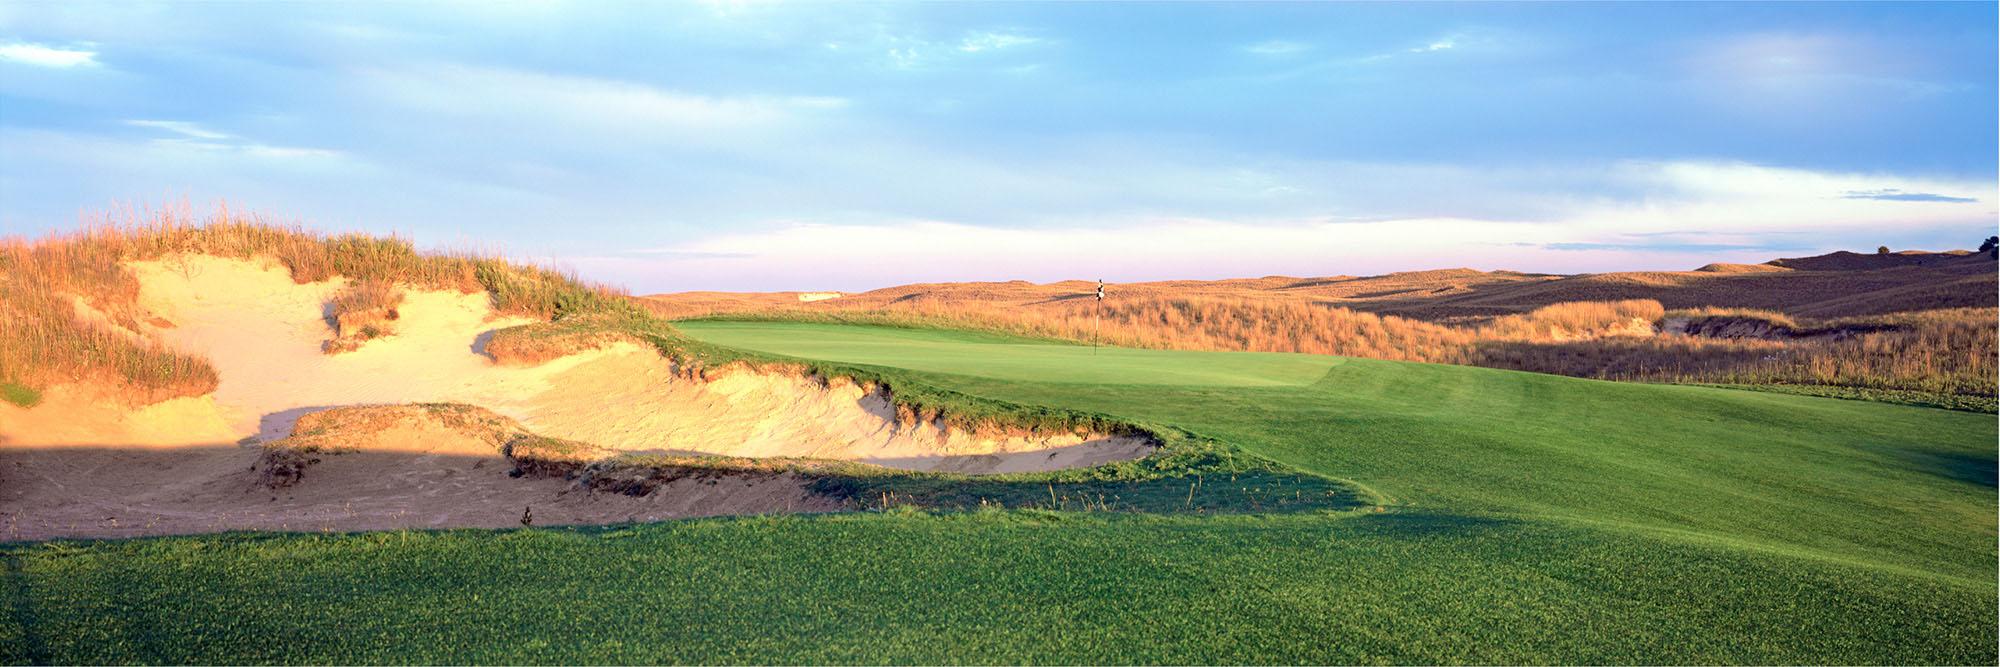 Golf Course Image - Sand Hills No. 7